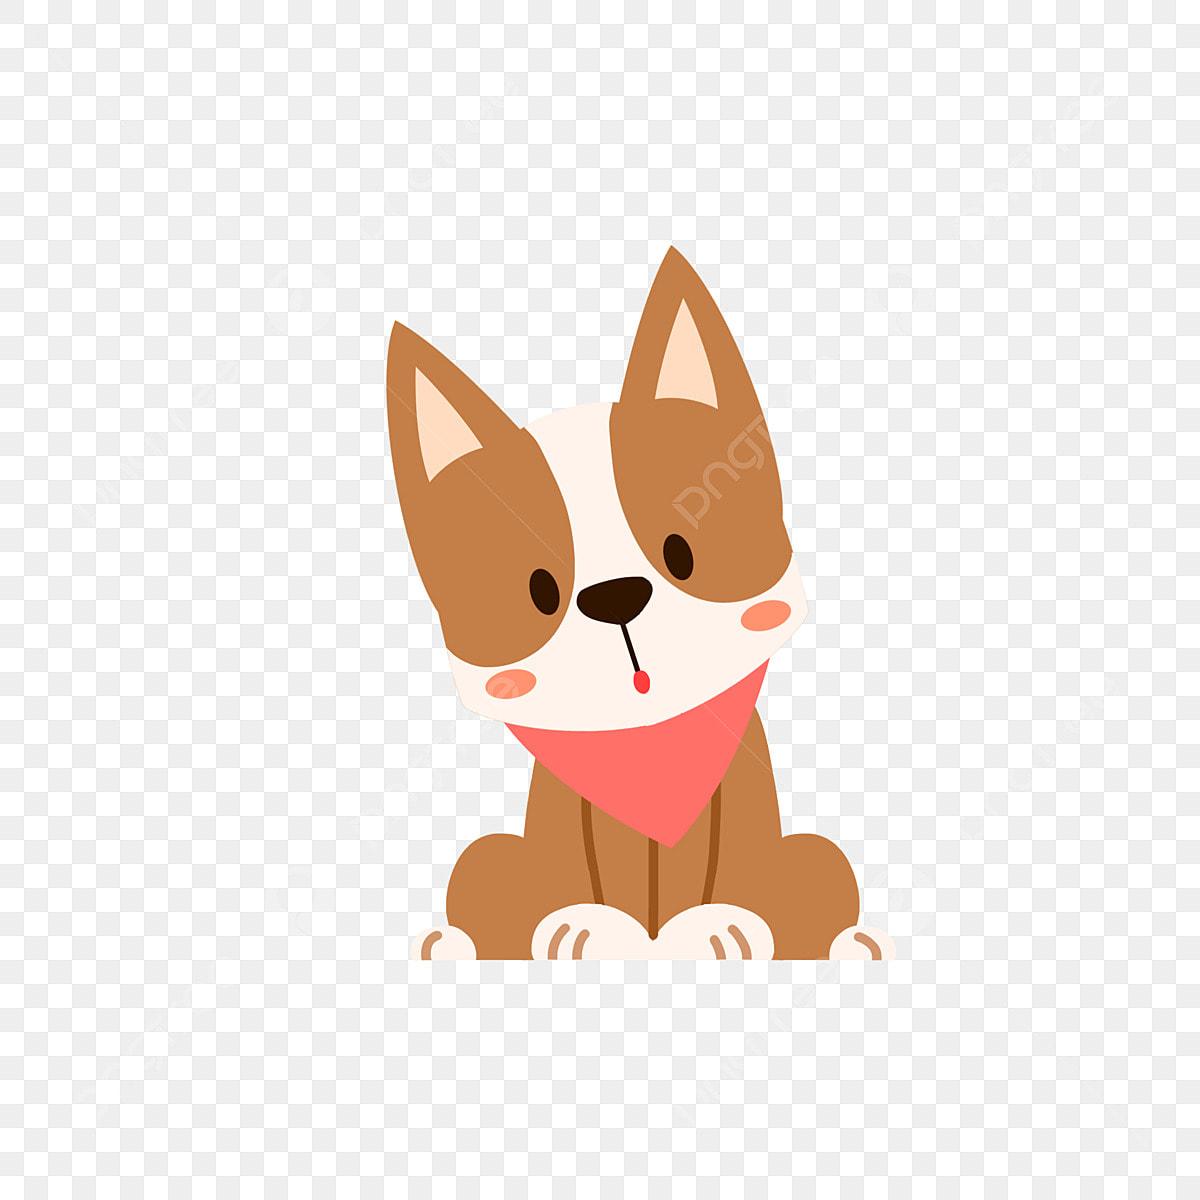 Corgi Corgi Clipart Pet Shop Pet Hospital Png Transparent Clipart Image And Psd File For Free Download